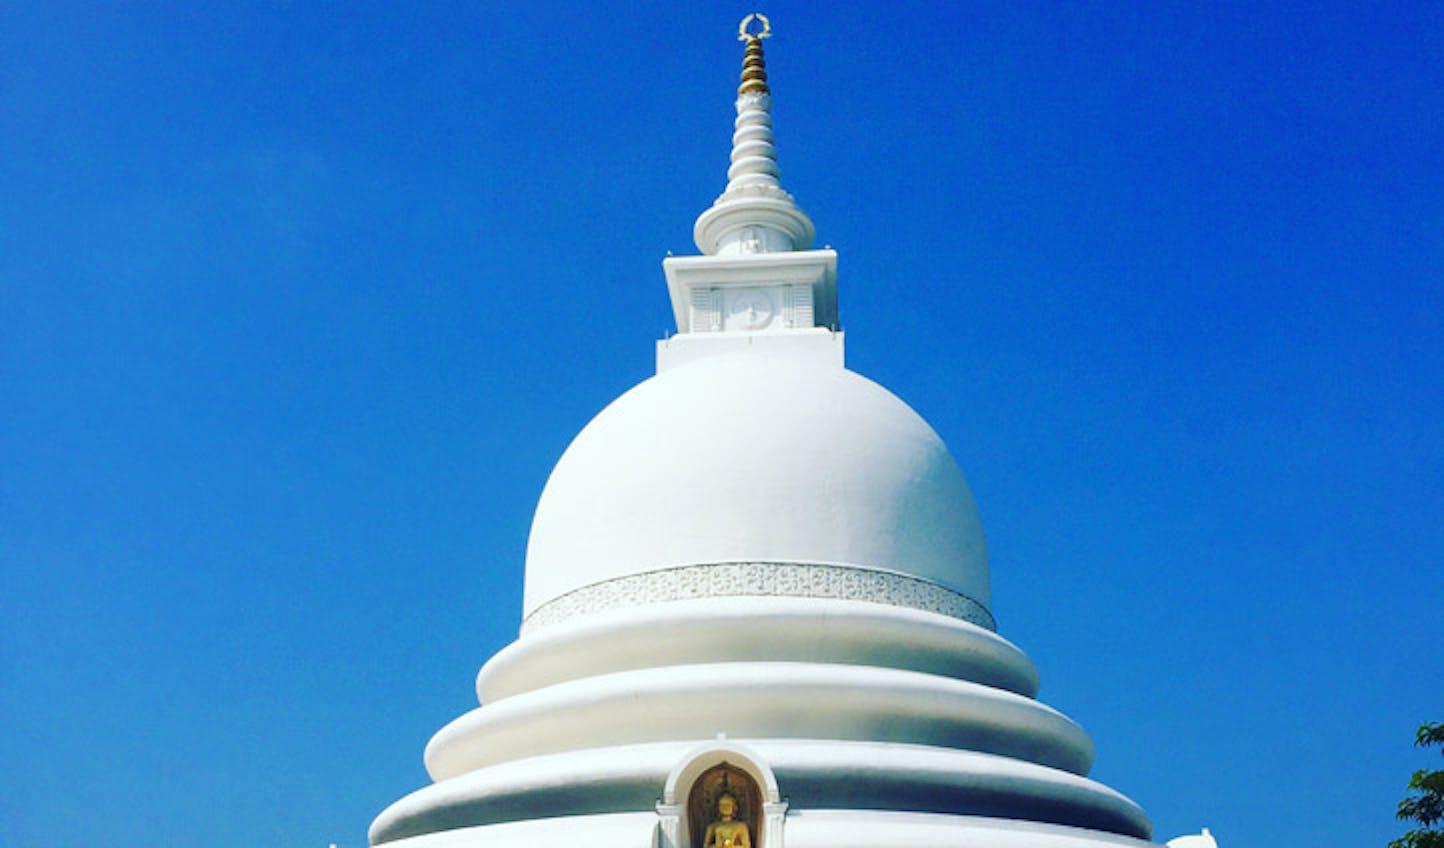 Sri Lankan architecture at its finest